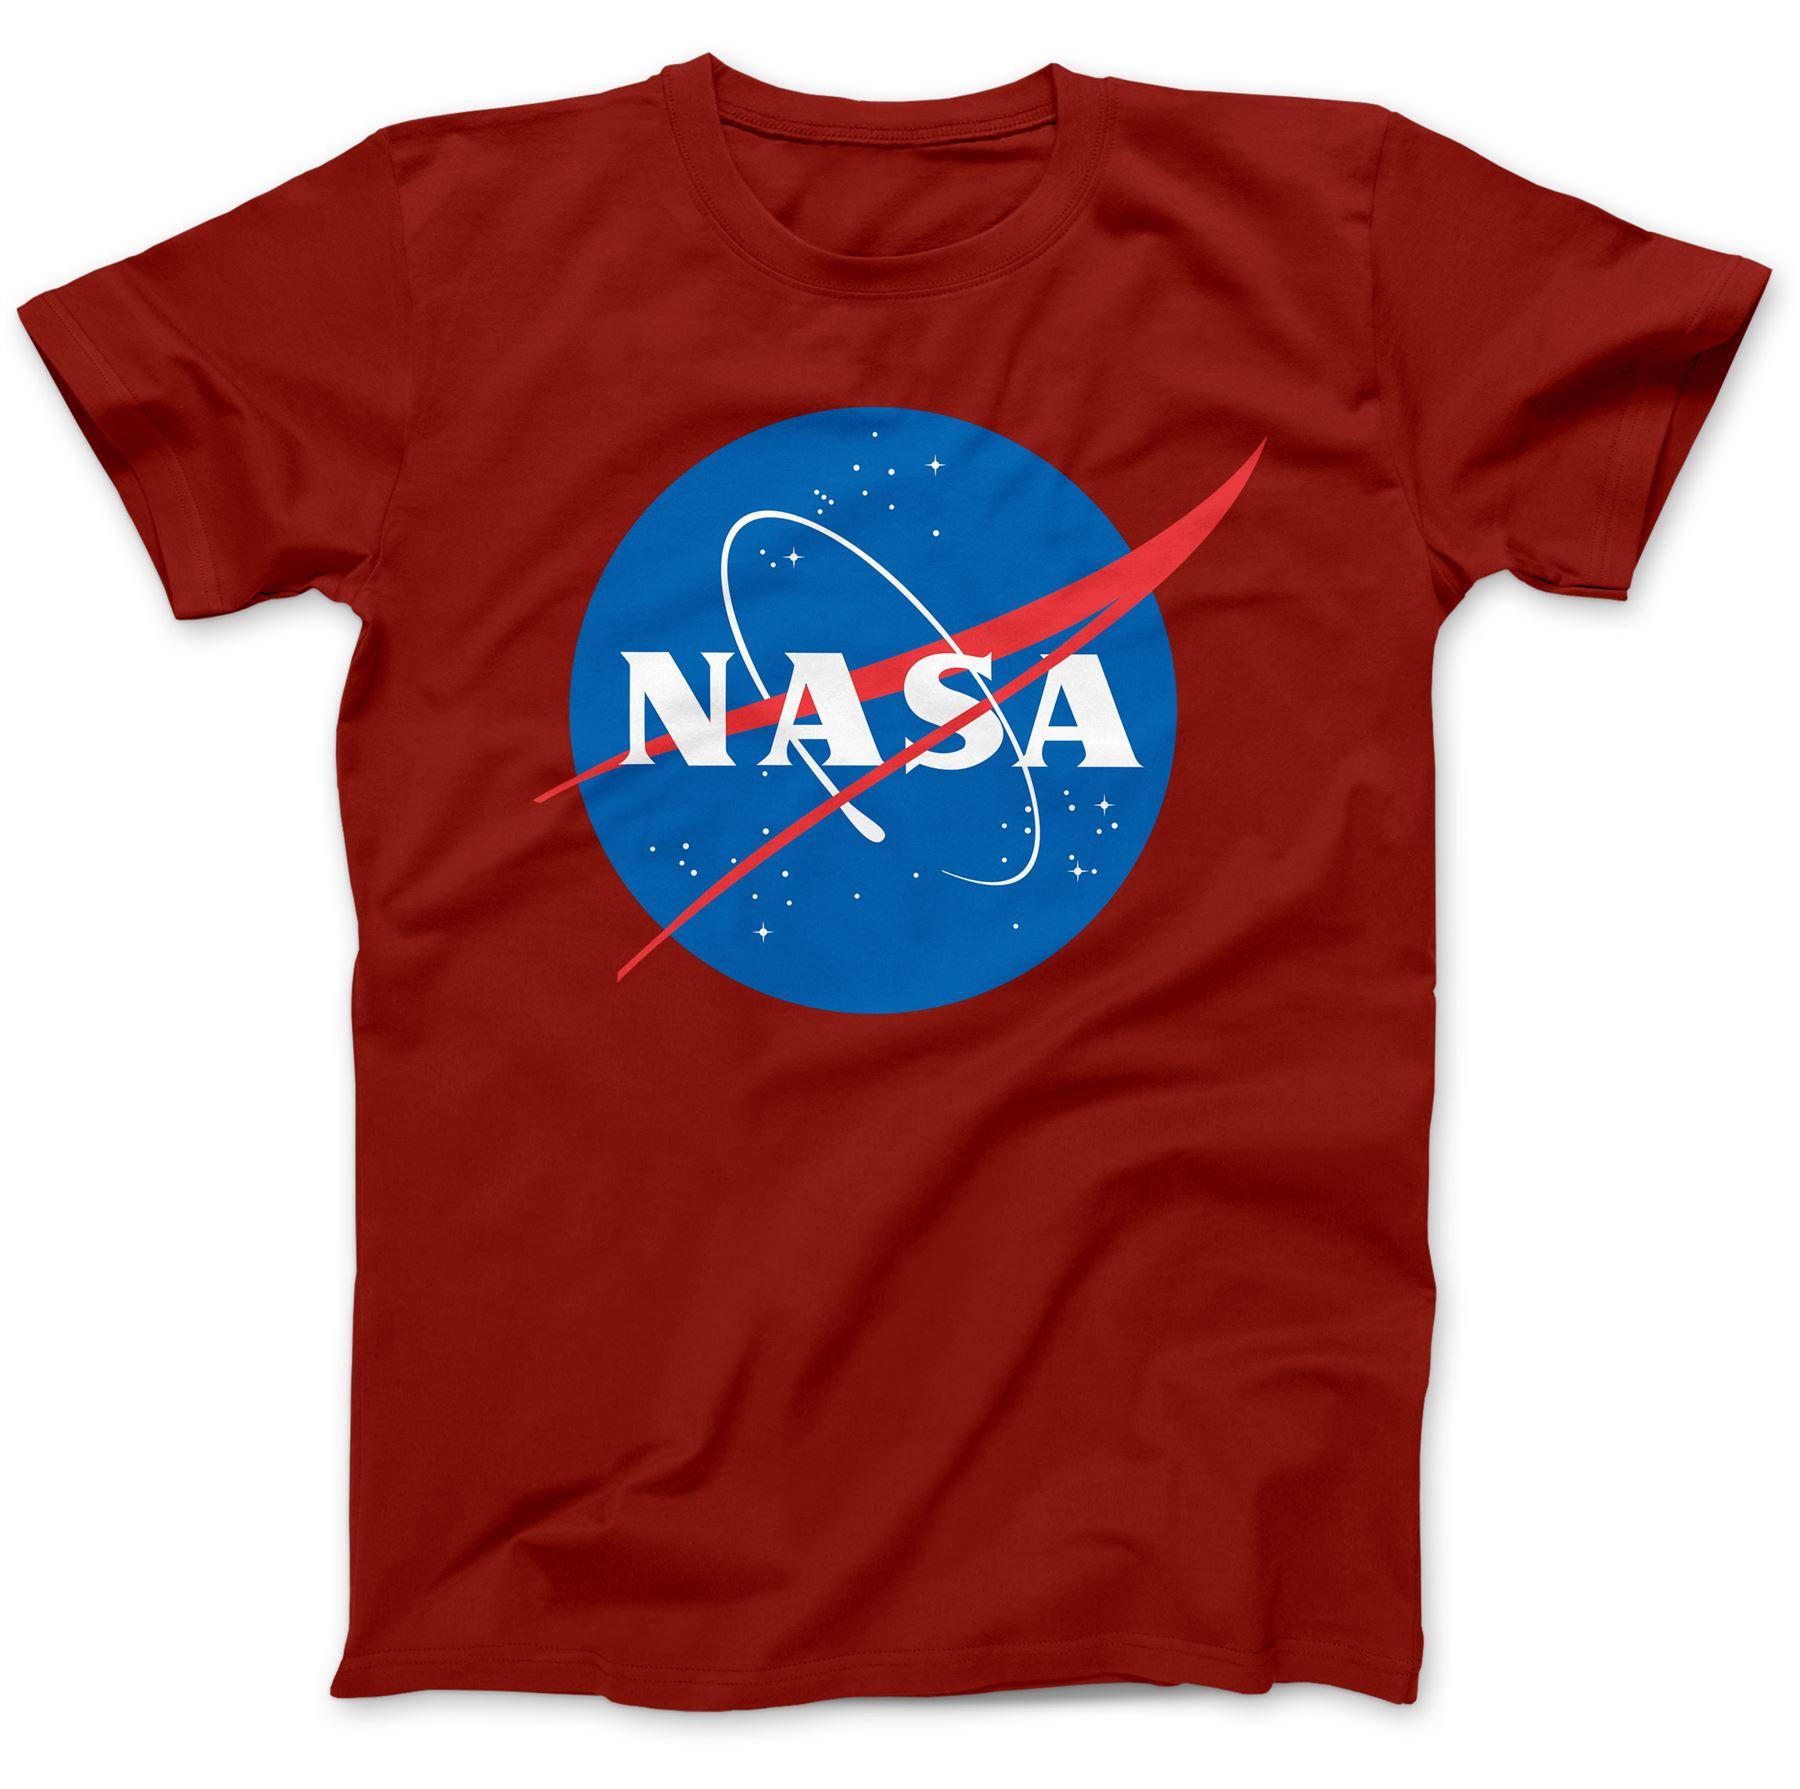 astronaut space t shirt - photo #23